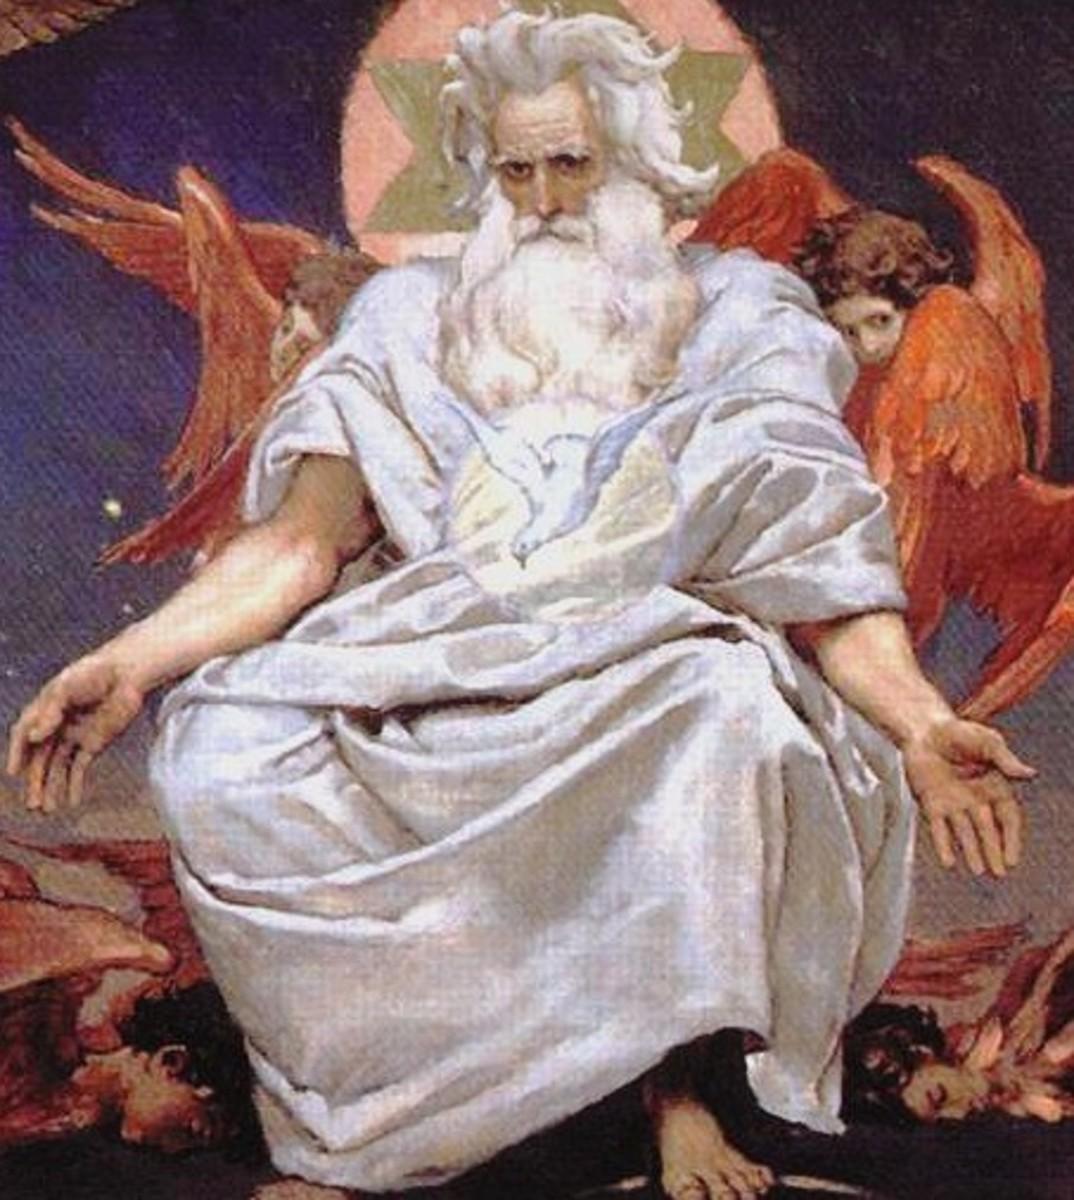 The Abrahamic God.